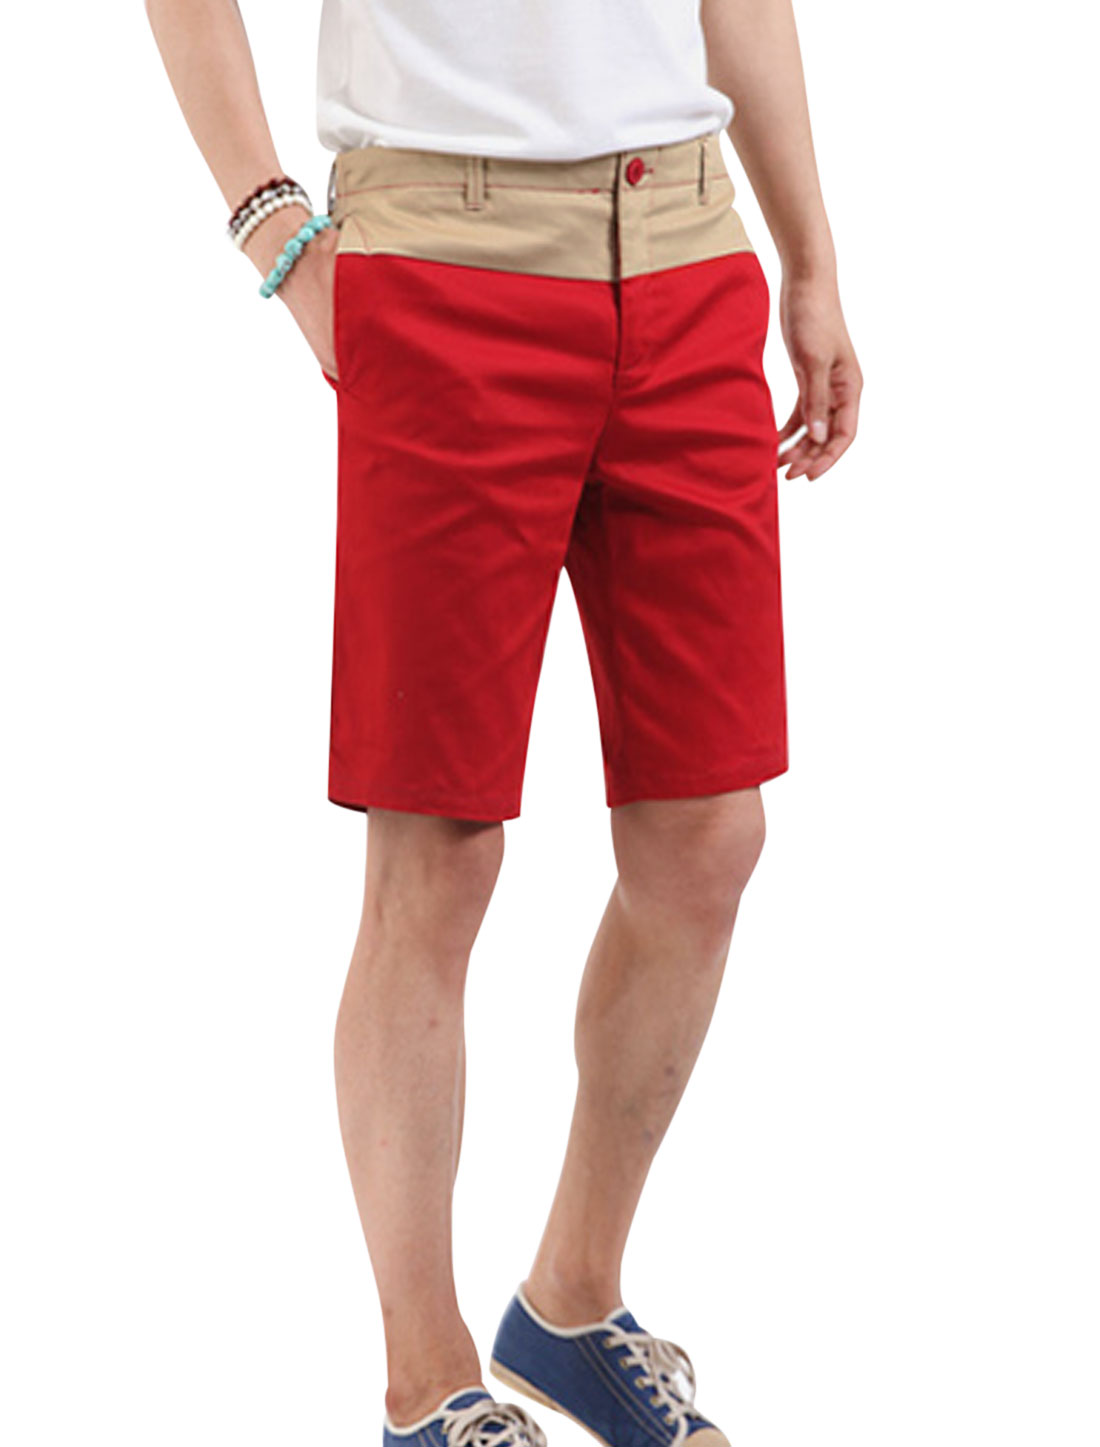 Men Color Block Fake Flap Pockets Back Cozy Fit Shorts Red Khaki W30